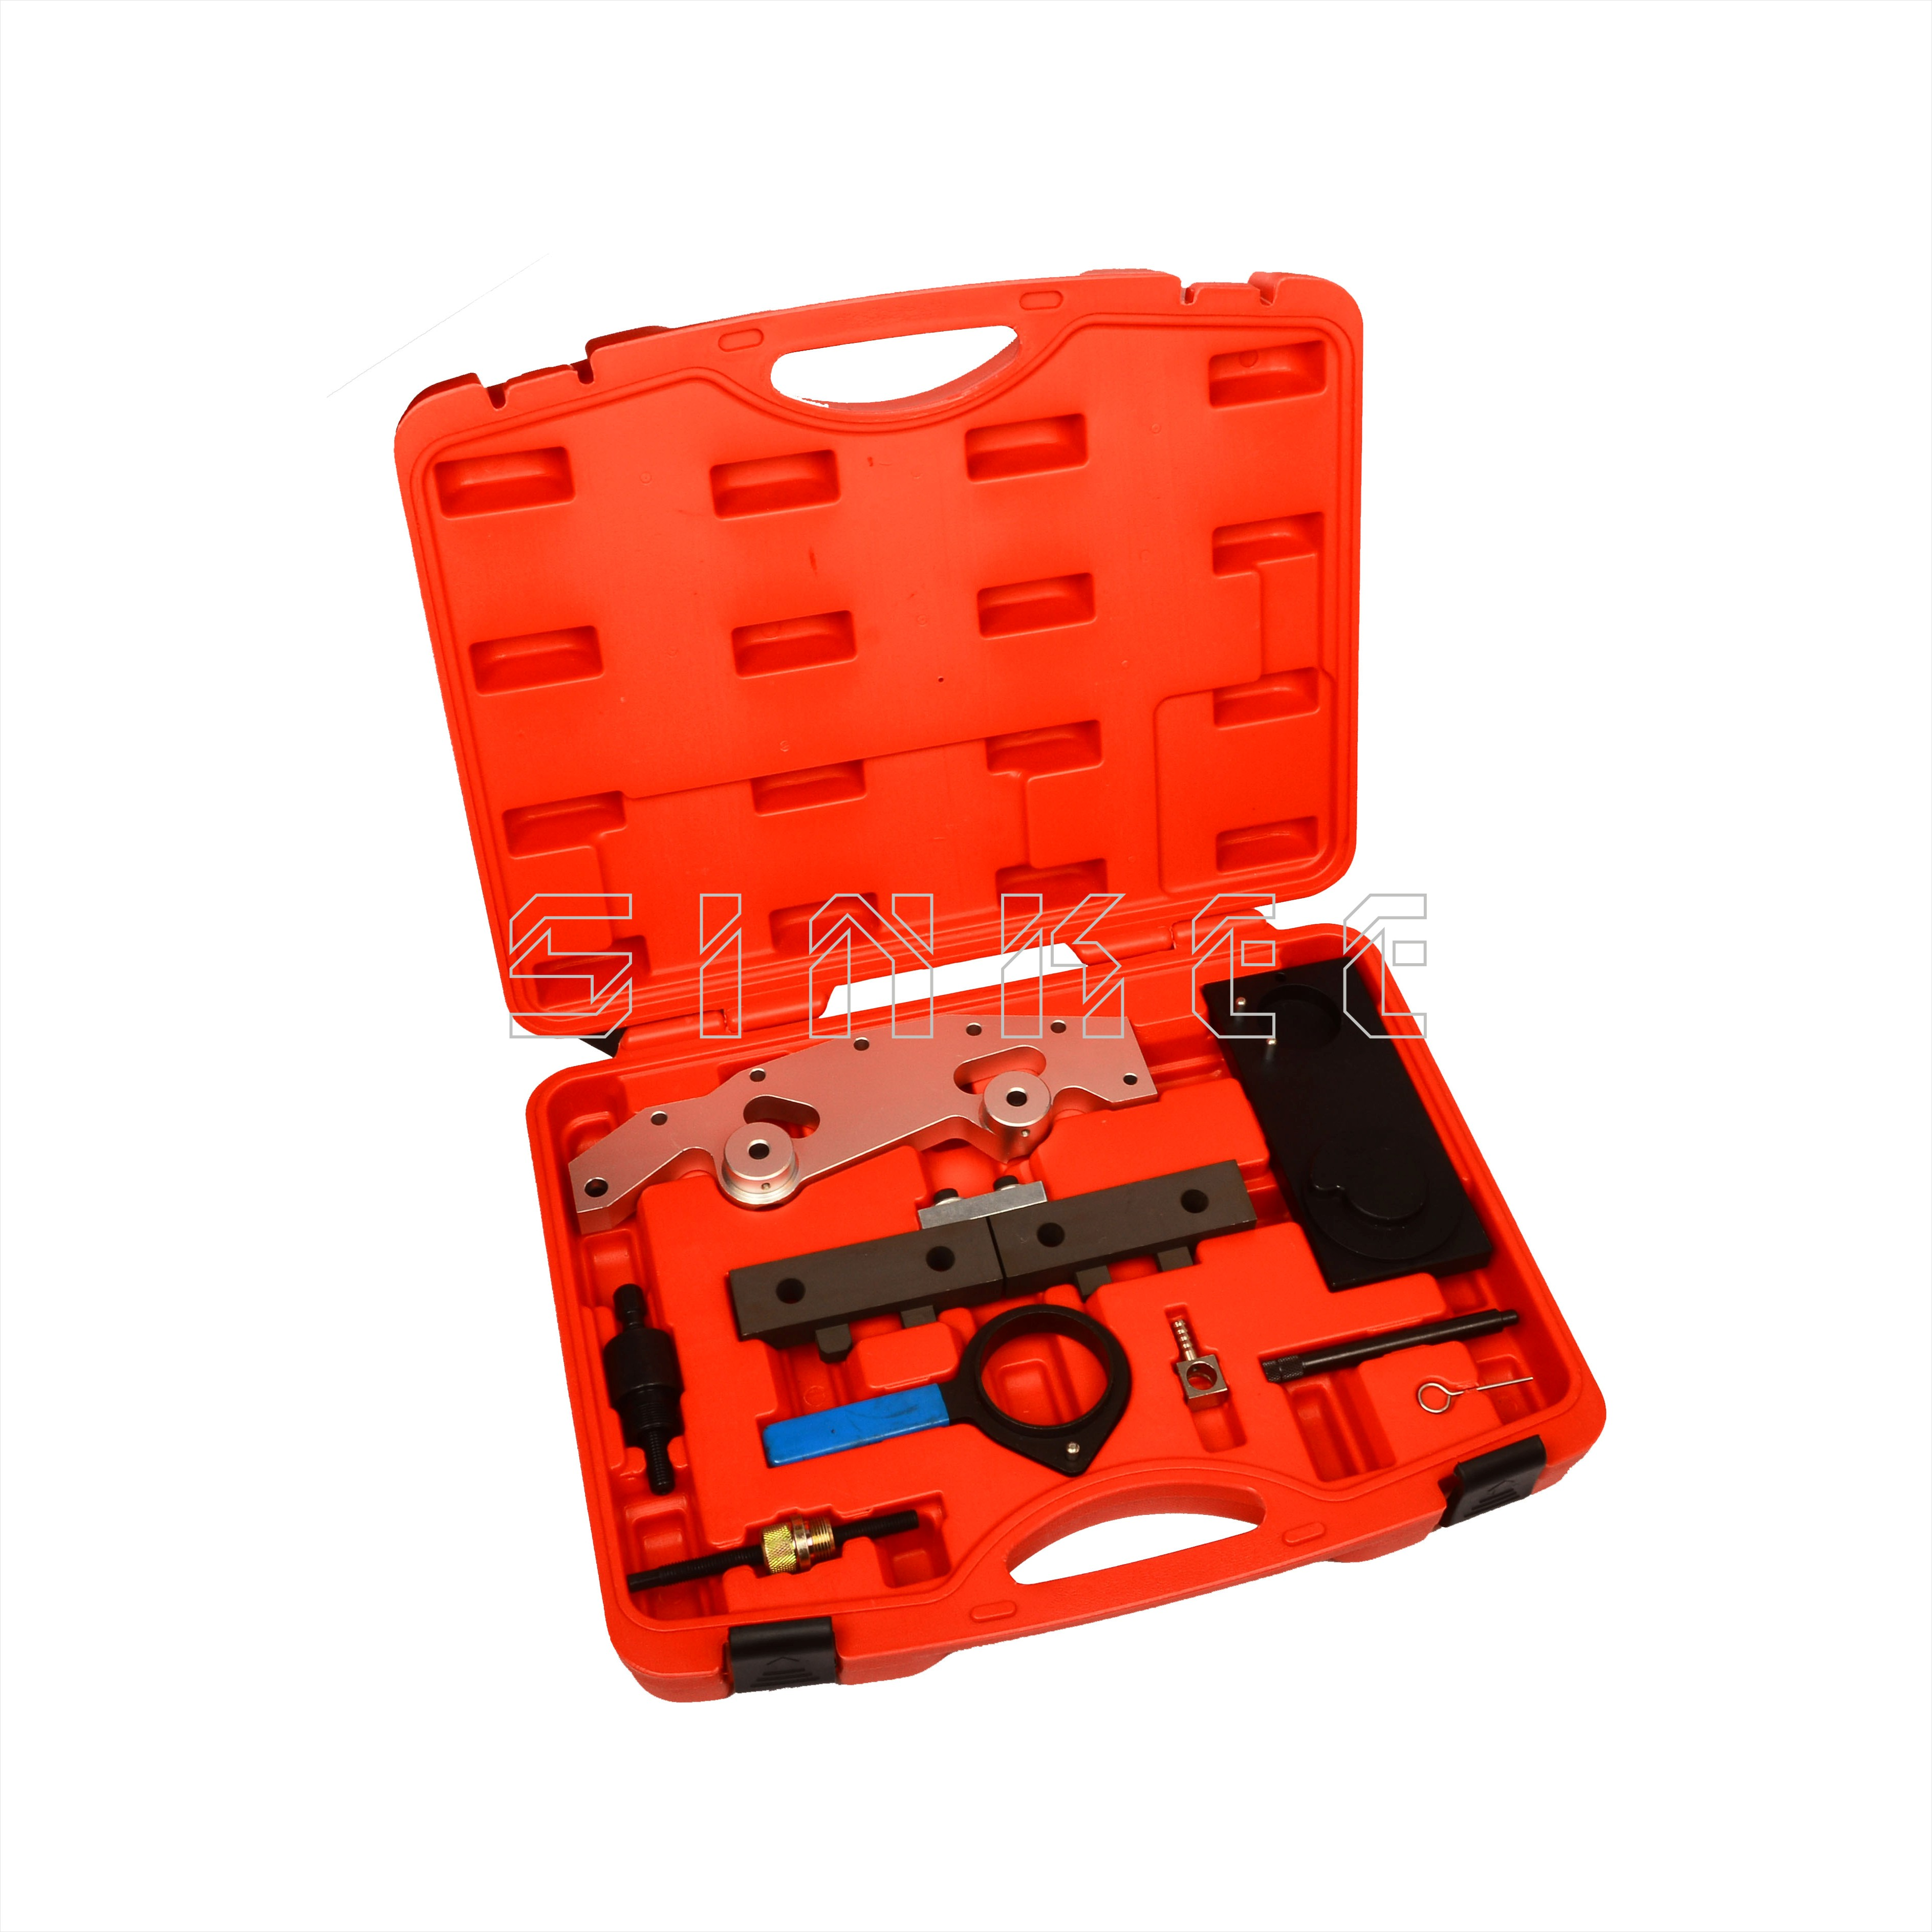 Double Vanos Master Engine Camshaft Alignment Lock Timing Tool For BMW M52TU/M54/M56 double vanos car gargue tools for bmw m52 m52tu m54 m56 engines camshaft alignment timing locking tool